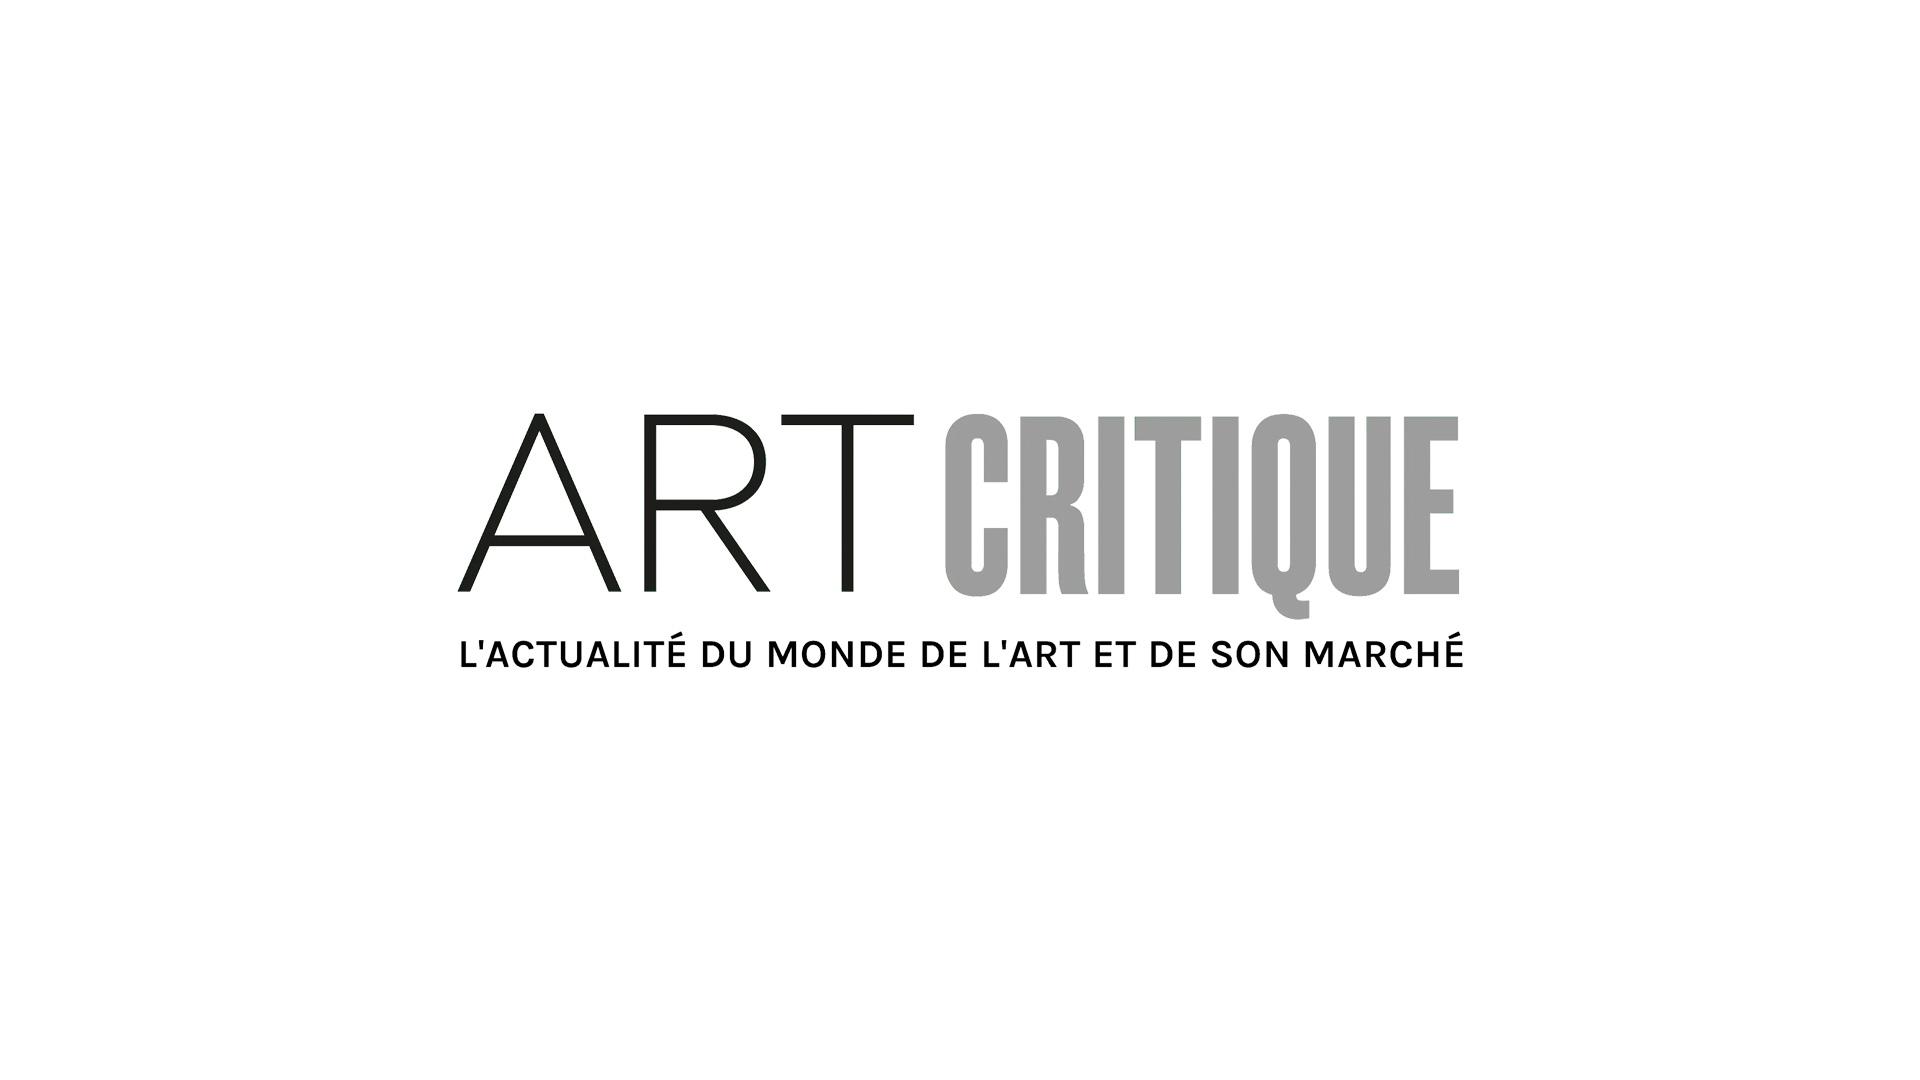 Porsche's Type 64 Nazi car failed to sell due to an auction error